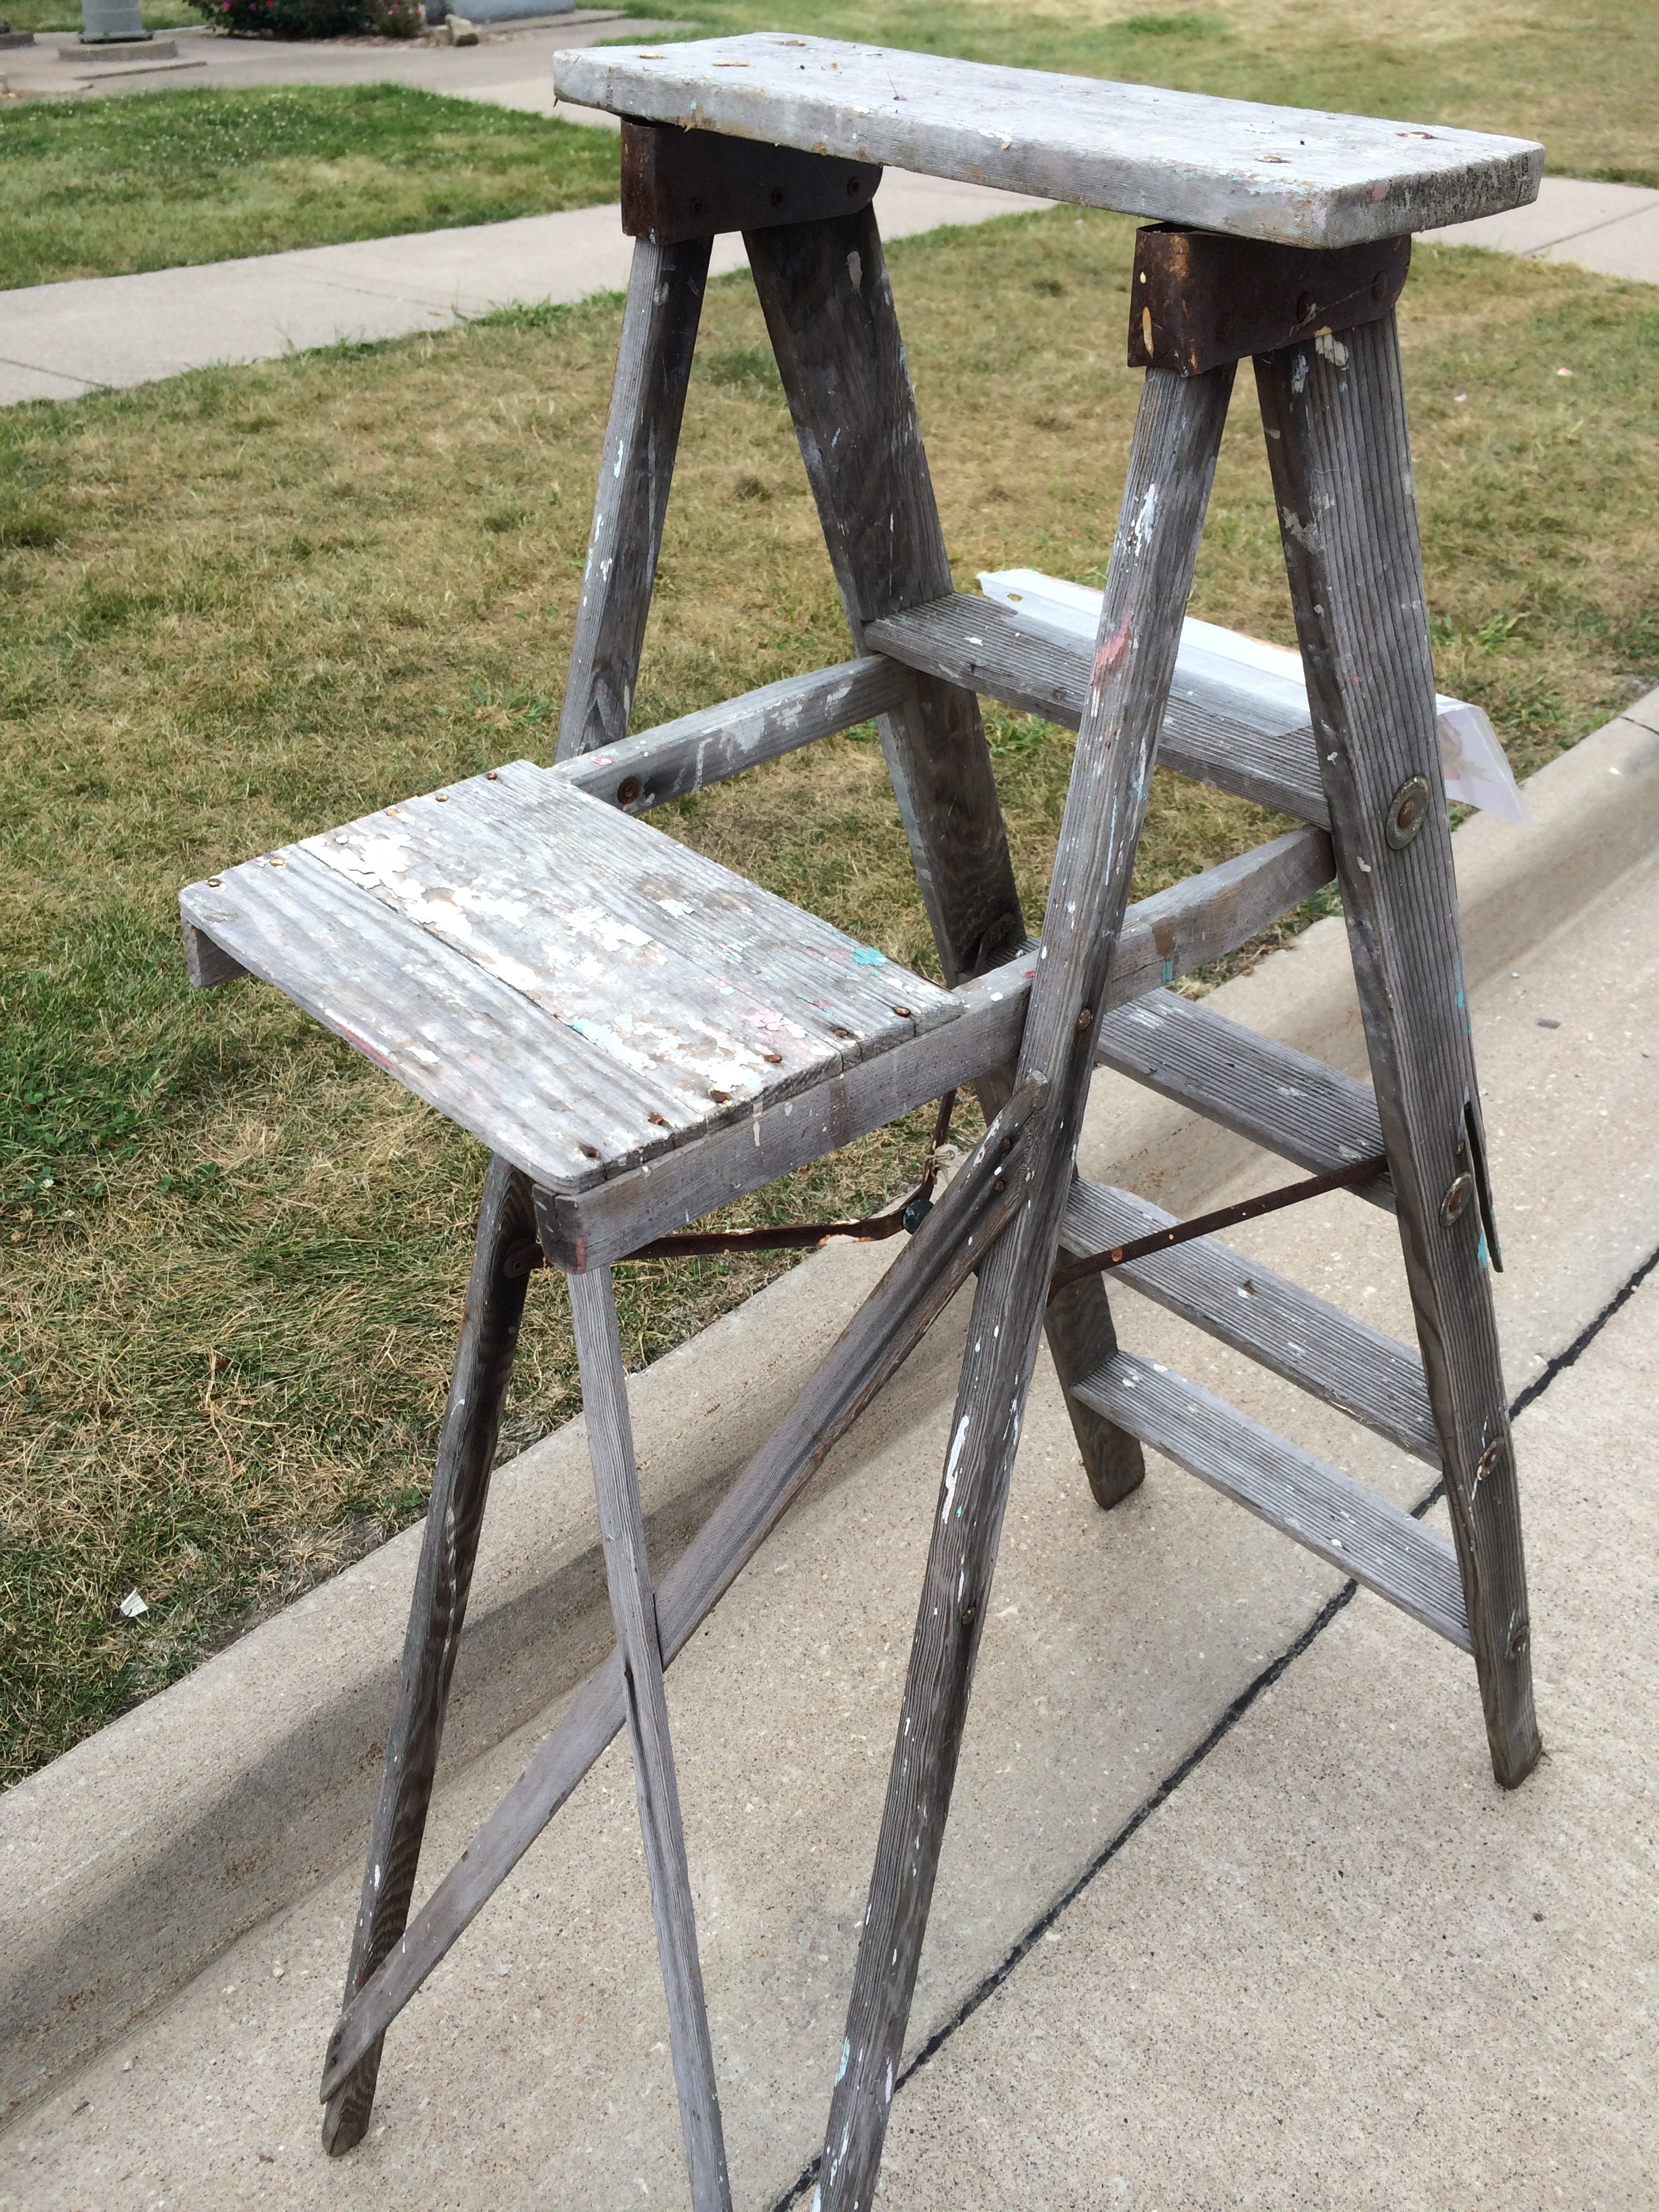 The worlds oldest ladder